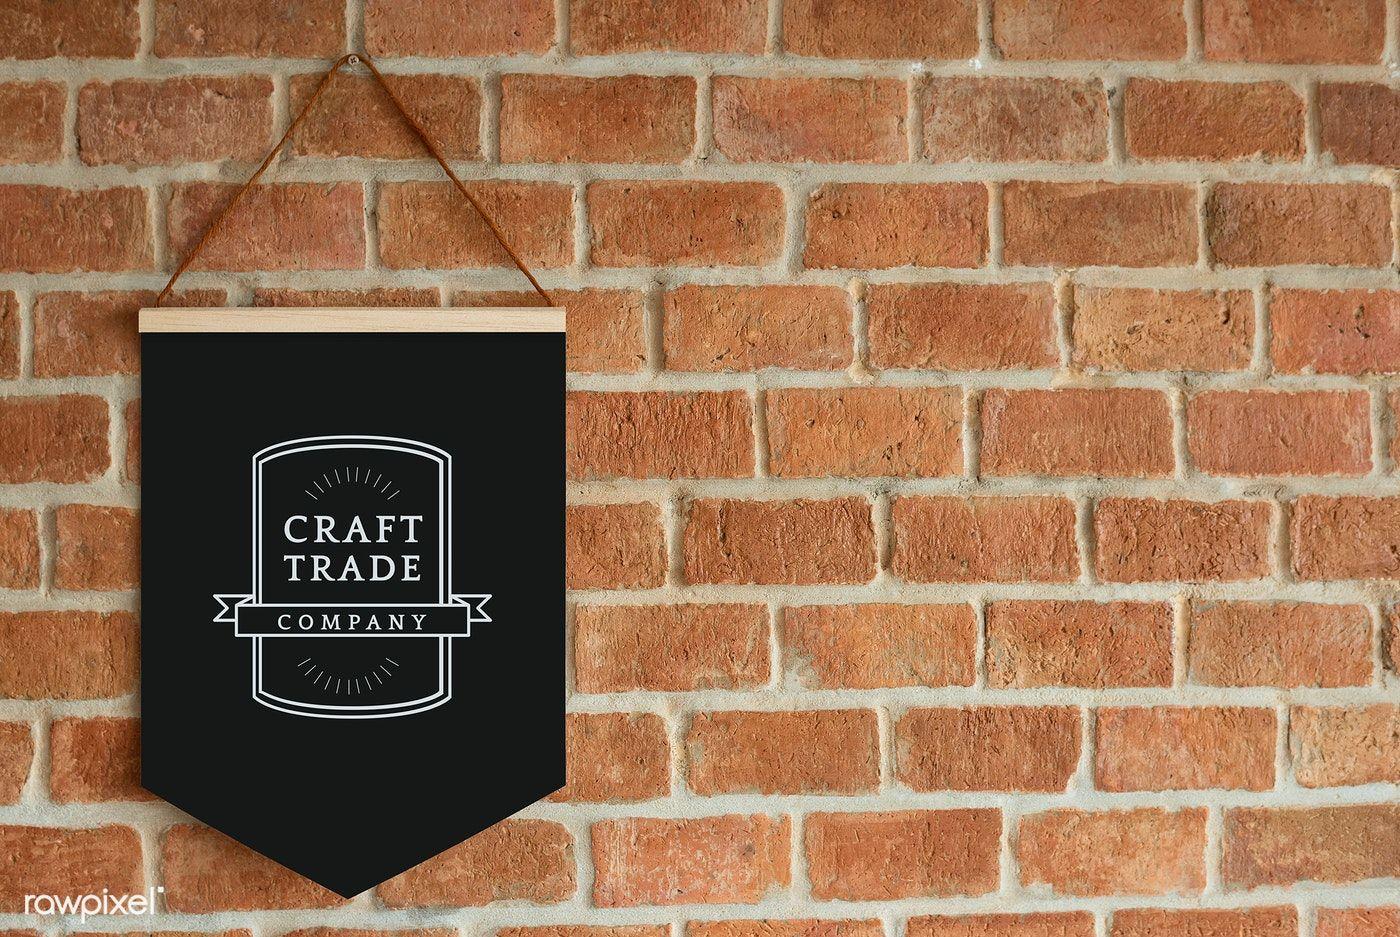 Craft trade company flag mockup | free image by rawpixel ...